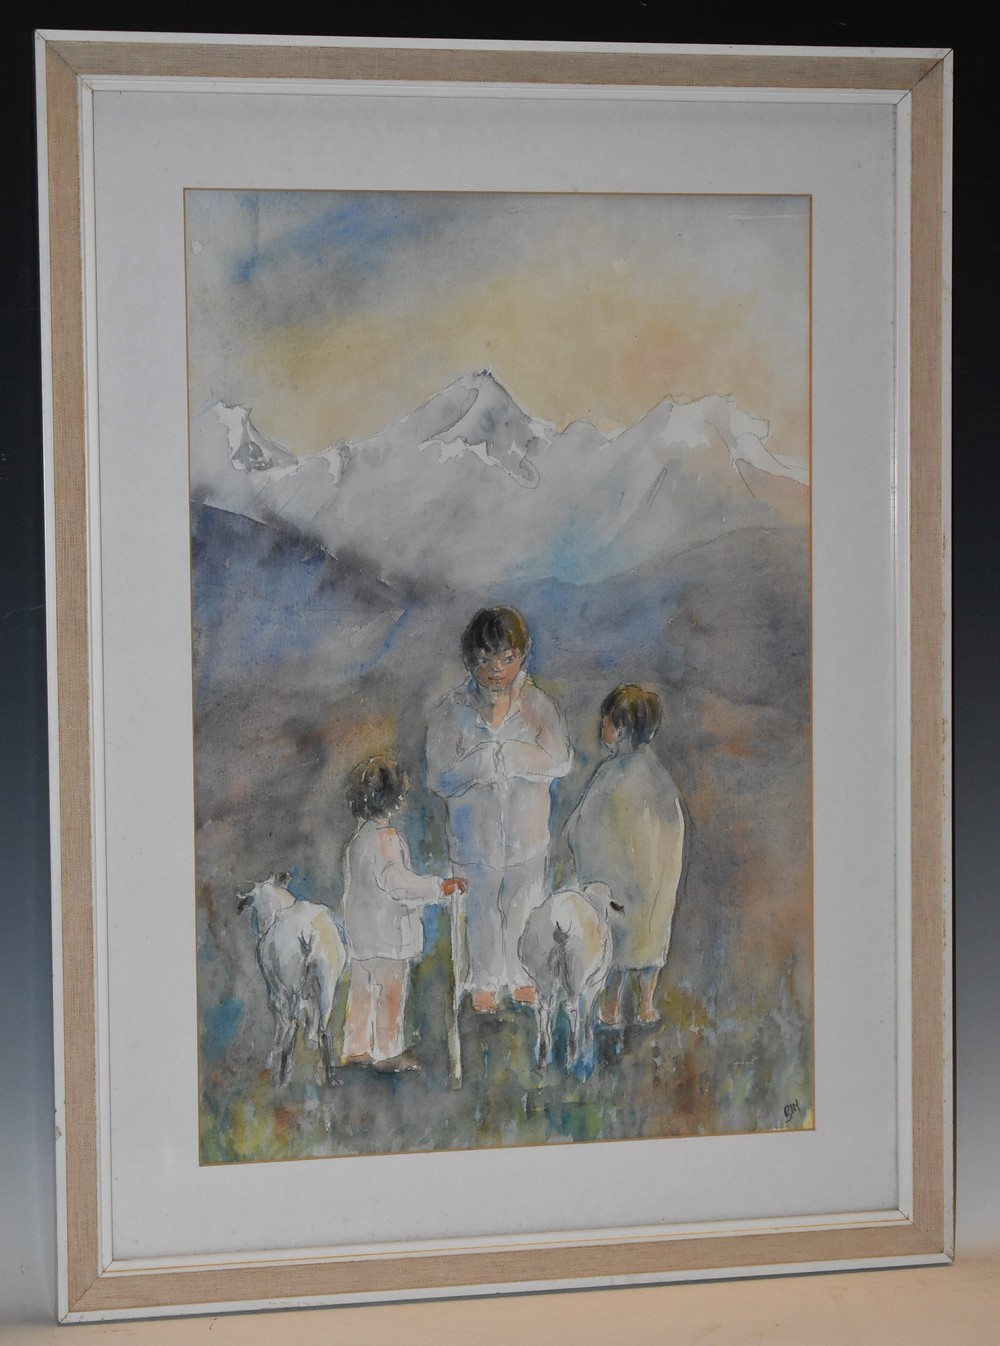 Bim Giardelli (British, 1917 - 2011) Nepalese Shepherd Boys signed, watercolour, 55cm x 36.